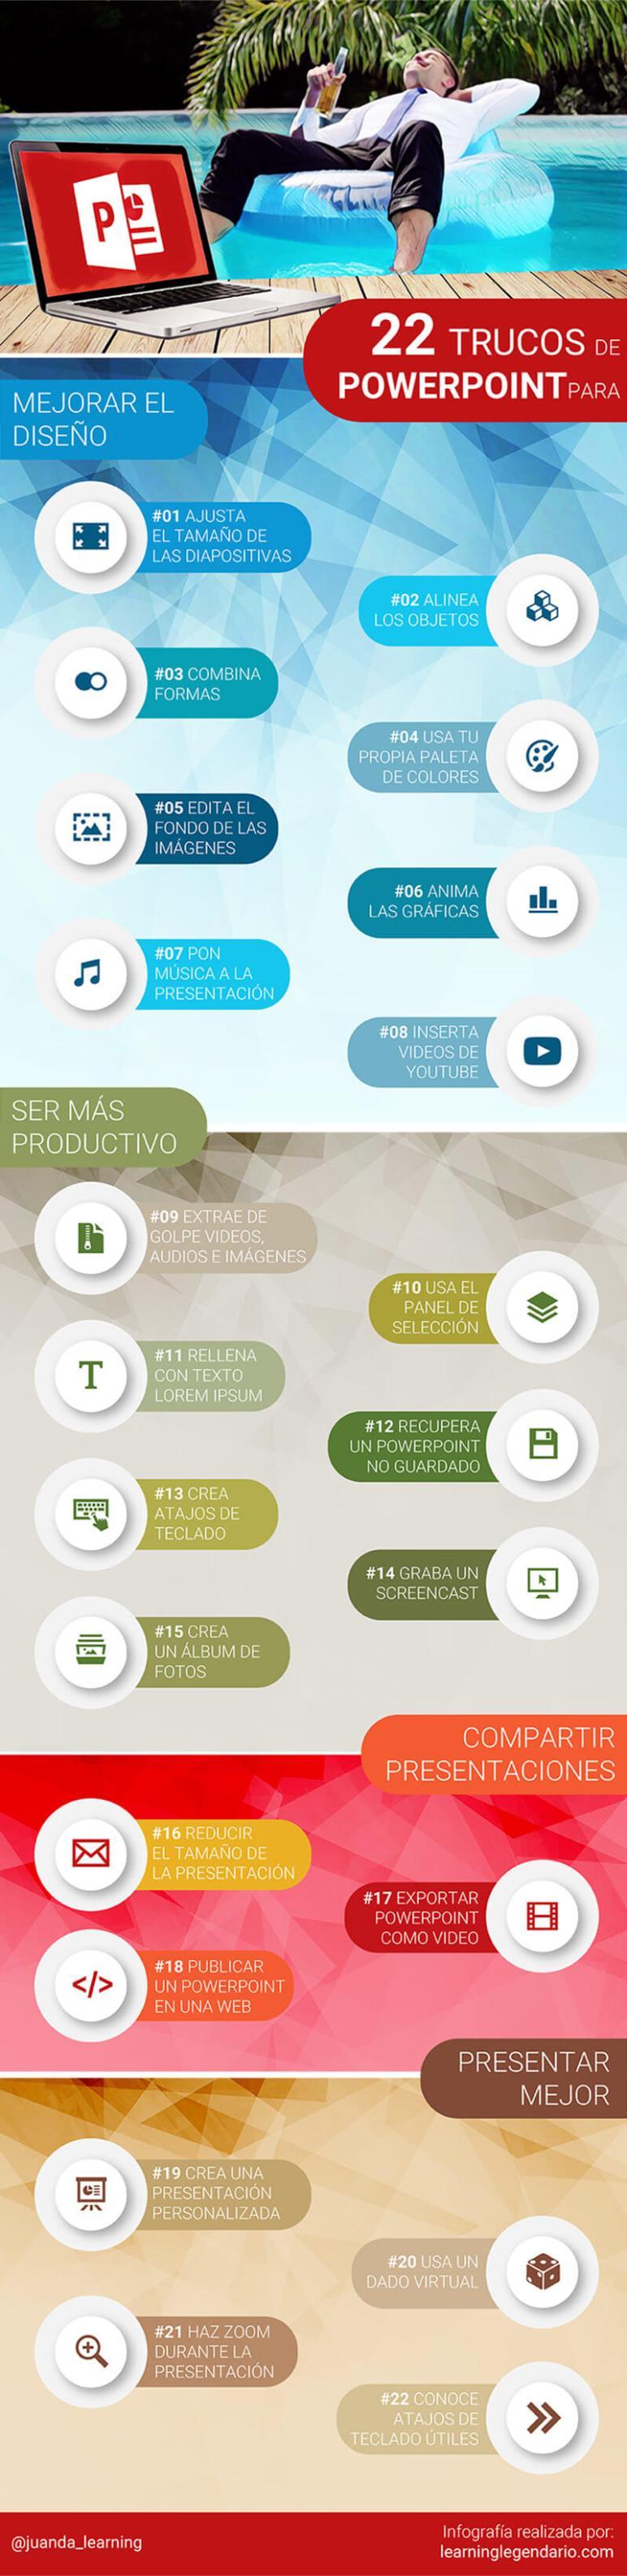 Infografía mejores trucos de PowerPoint